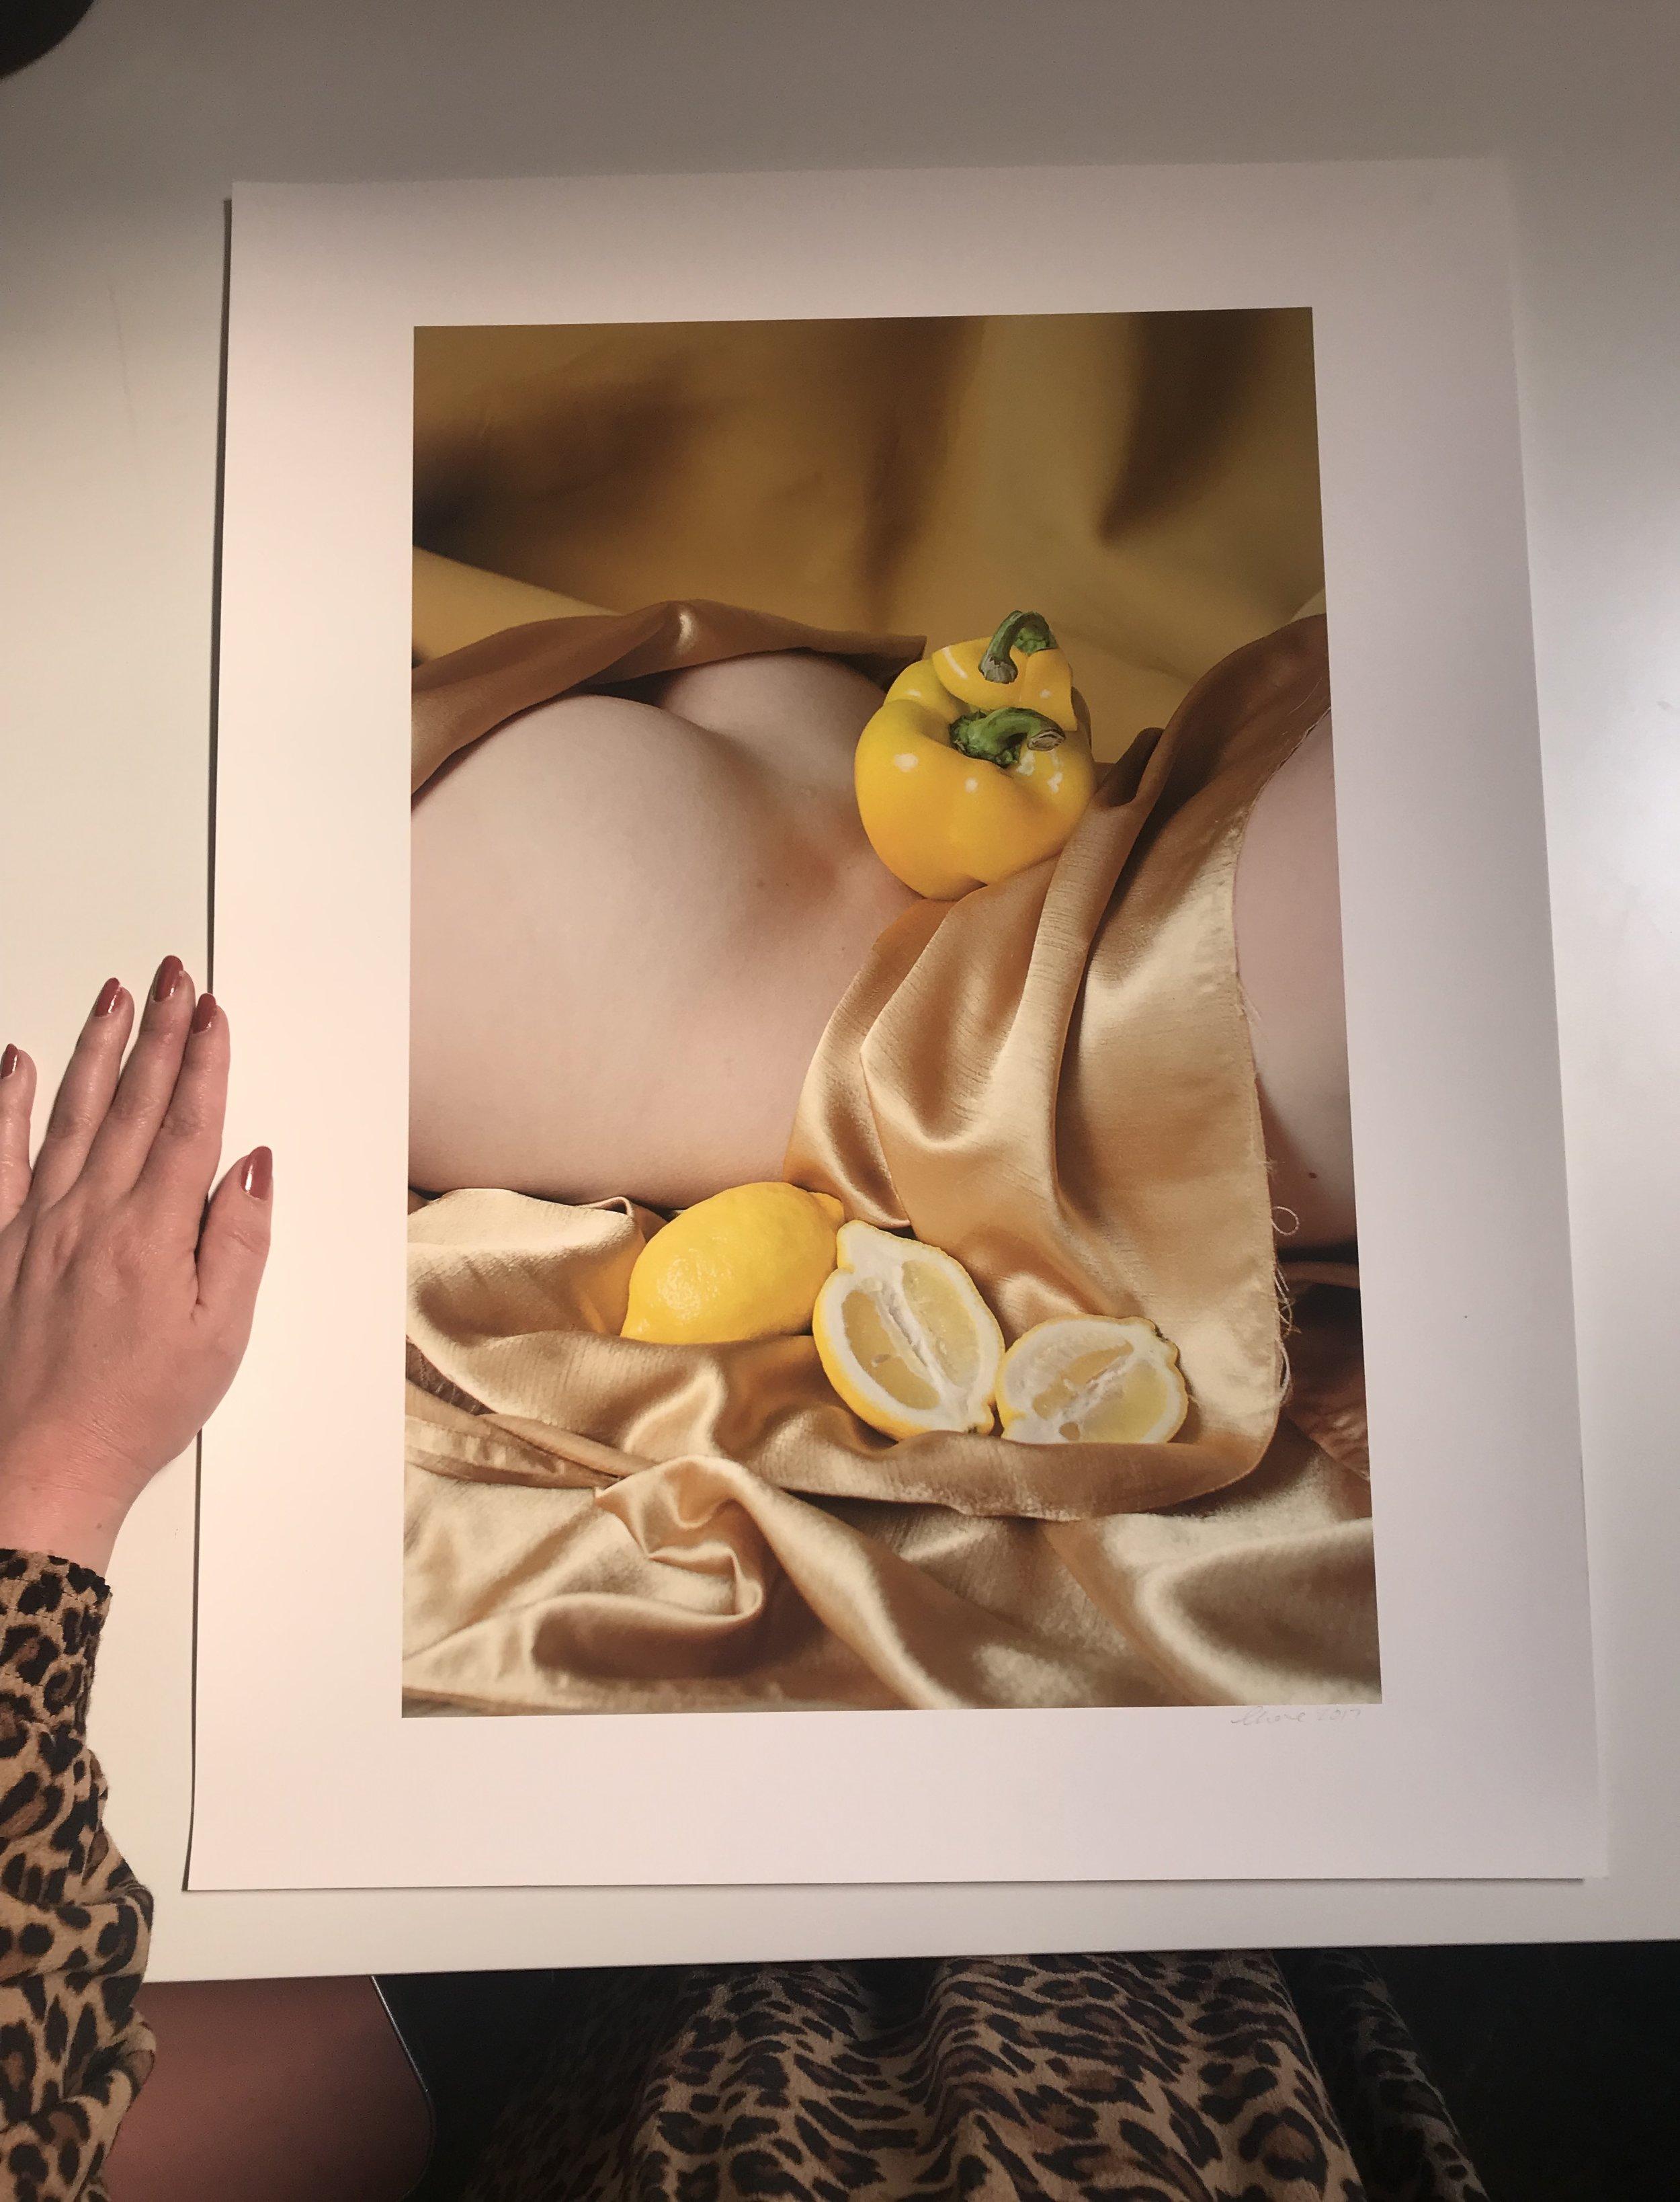 Artist's Model by Lauryn Hare